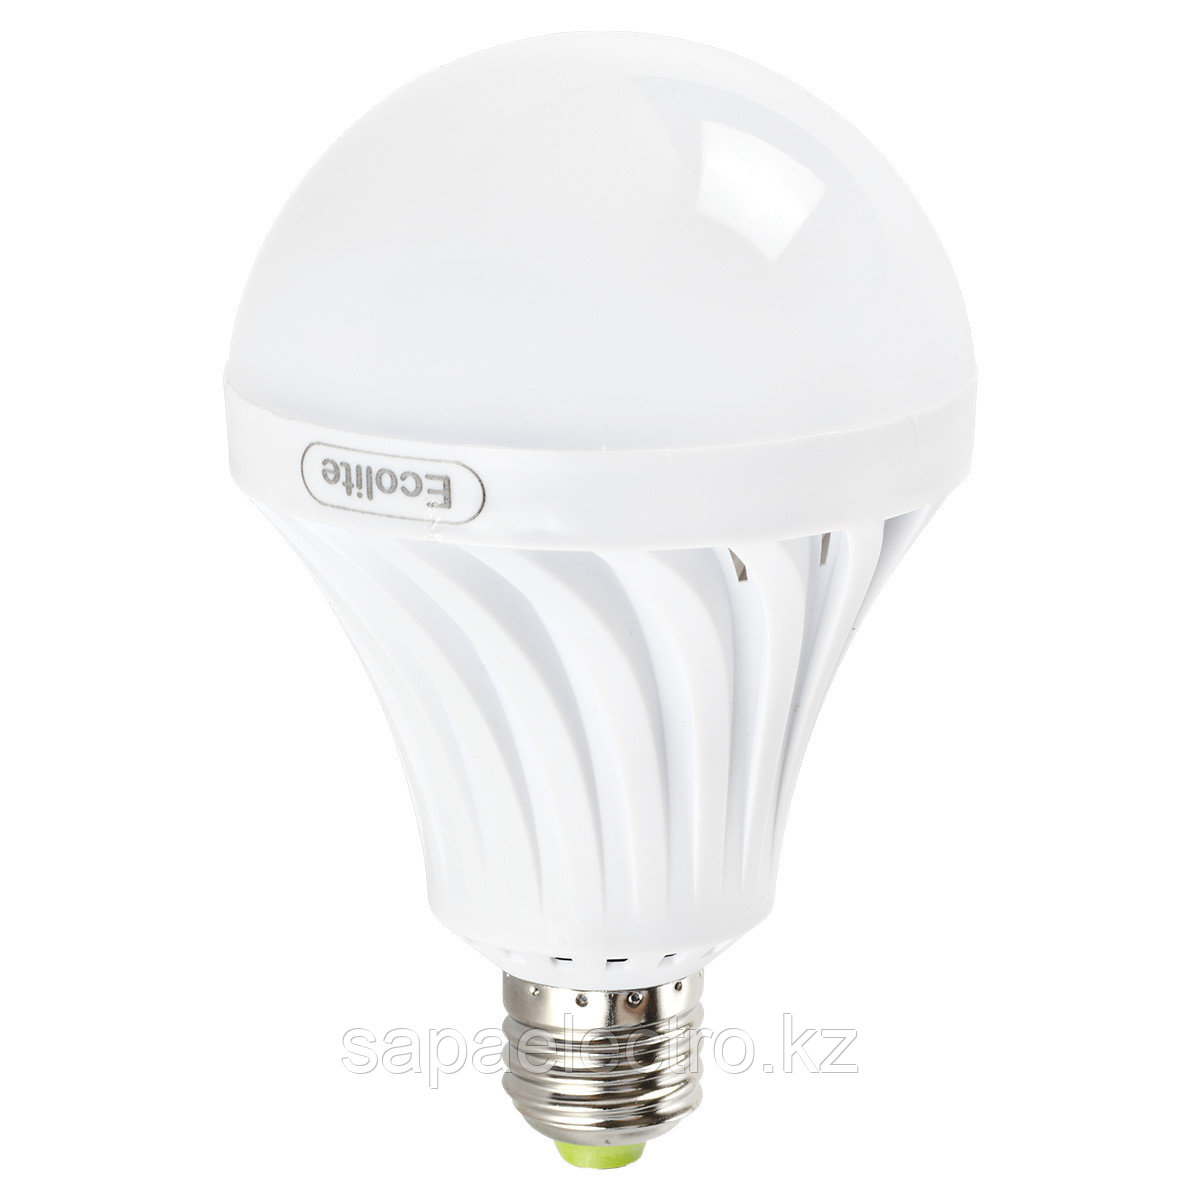 LampLED AVARIINAIA12W E276000KAC85-265V675L ECO100